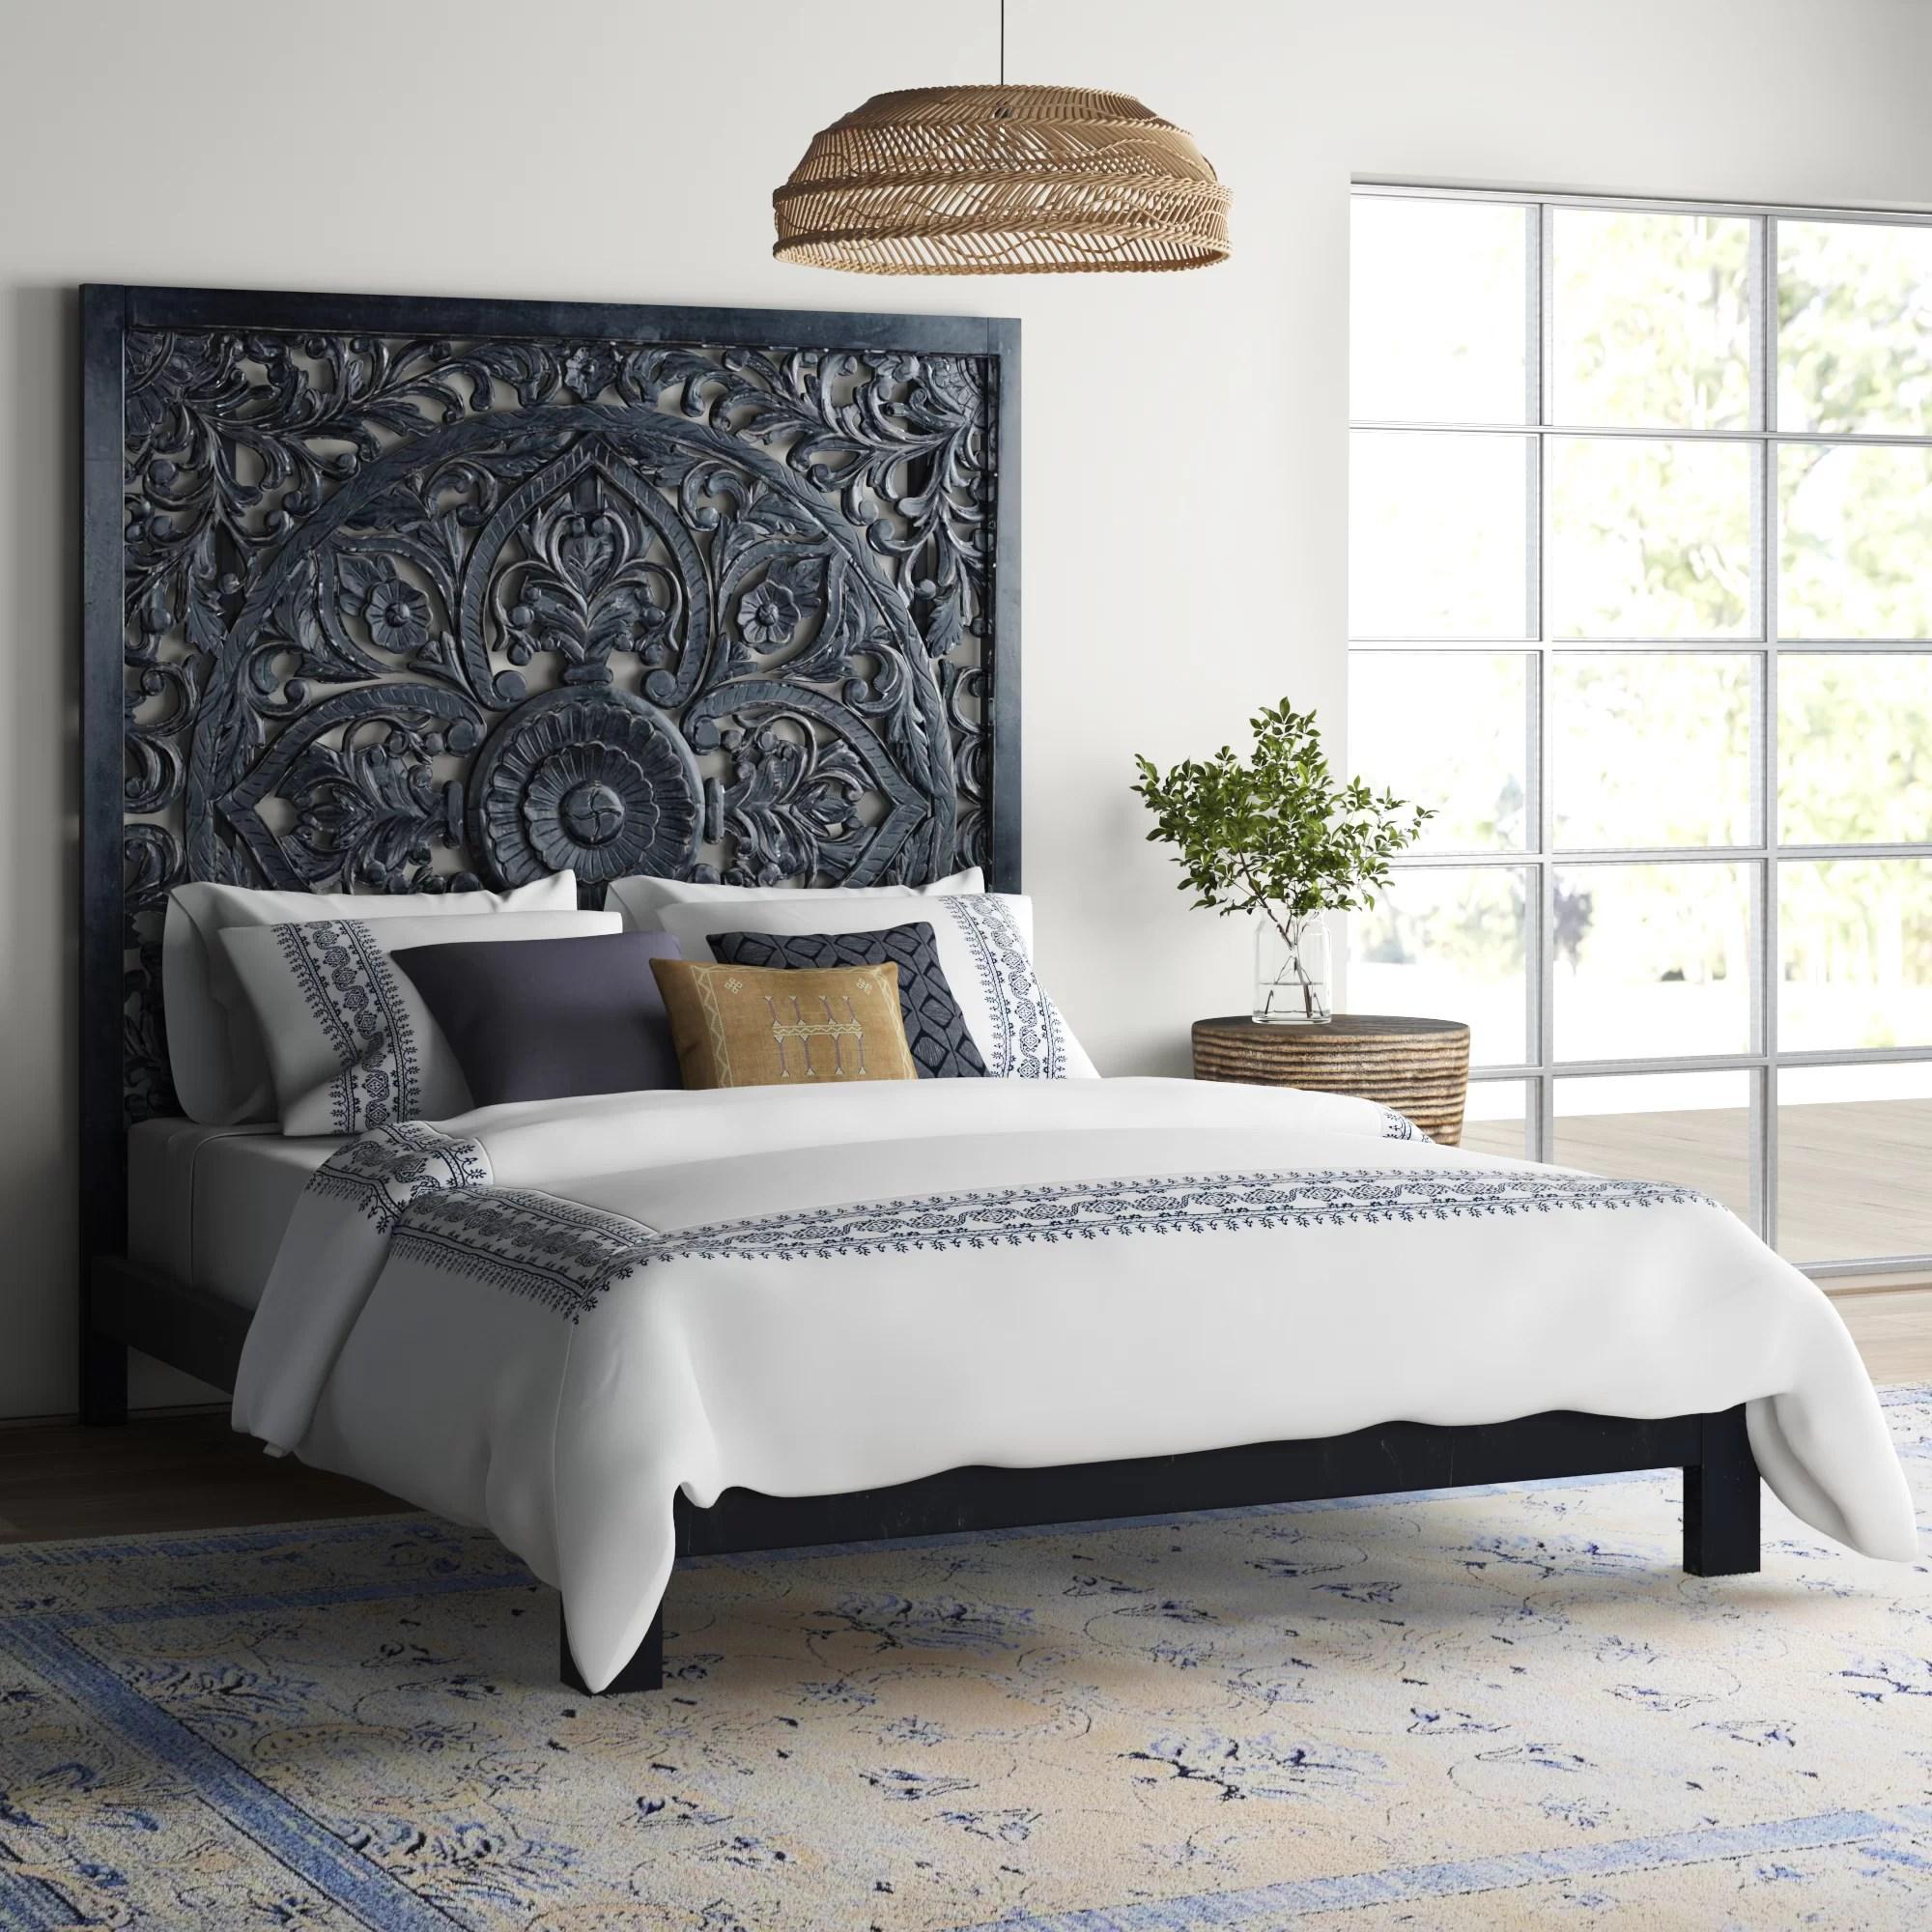 Bungalow Rose Corder Queen Solid Wood Platform Bed Reviews